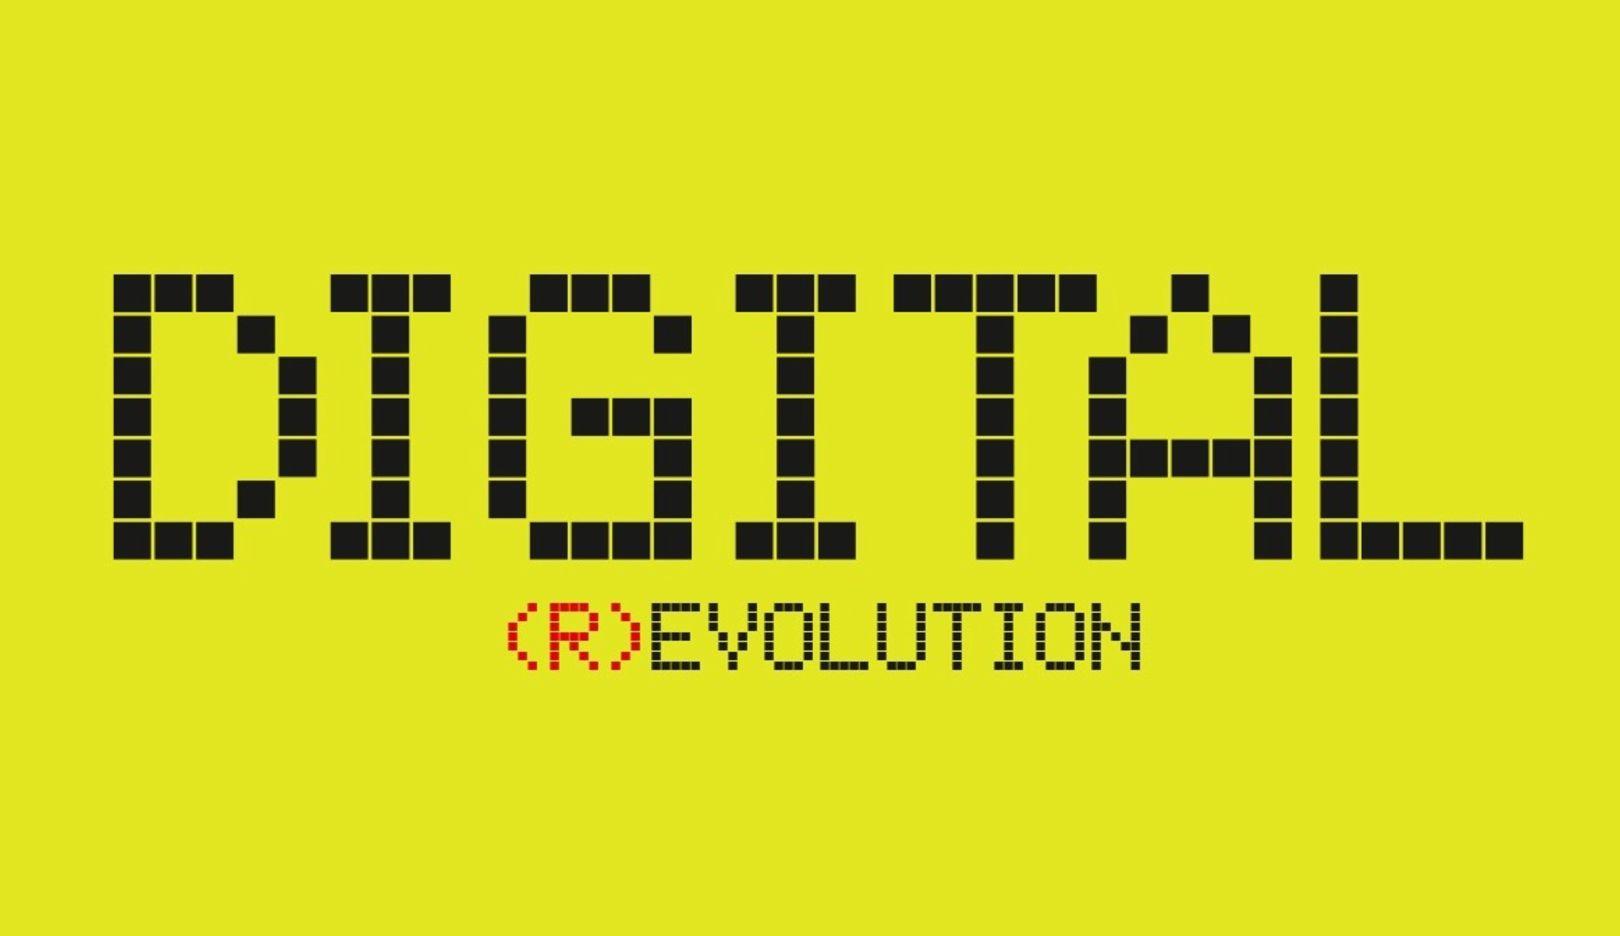 Digital Revolution, 2016, Porsche Consulting GmbH